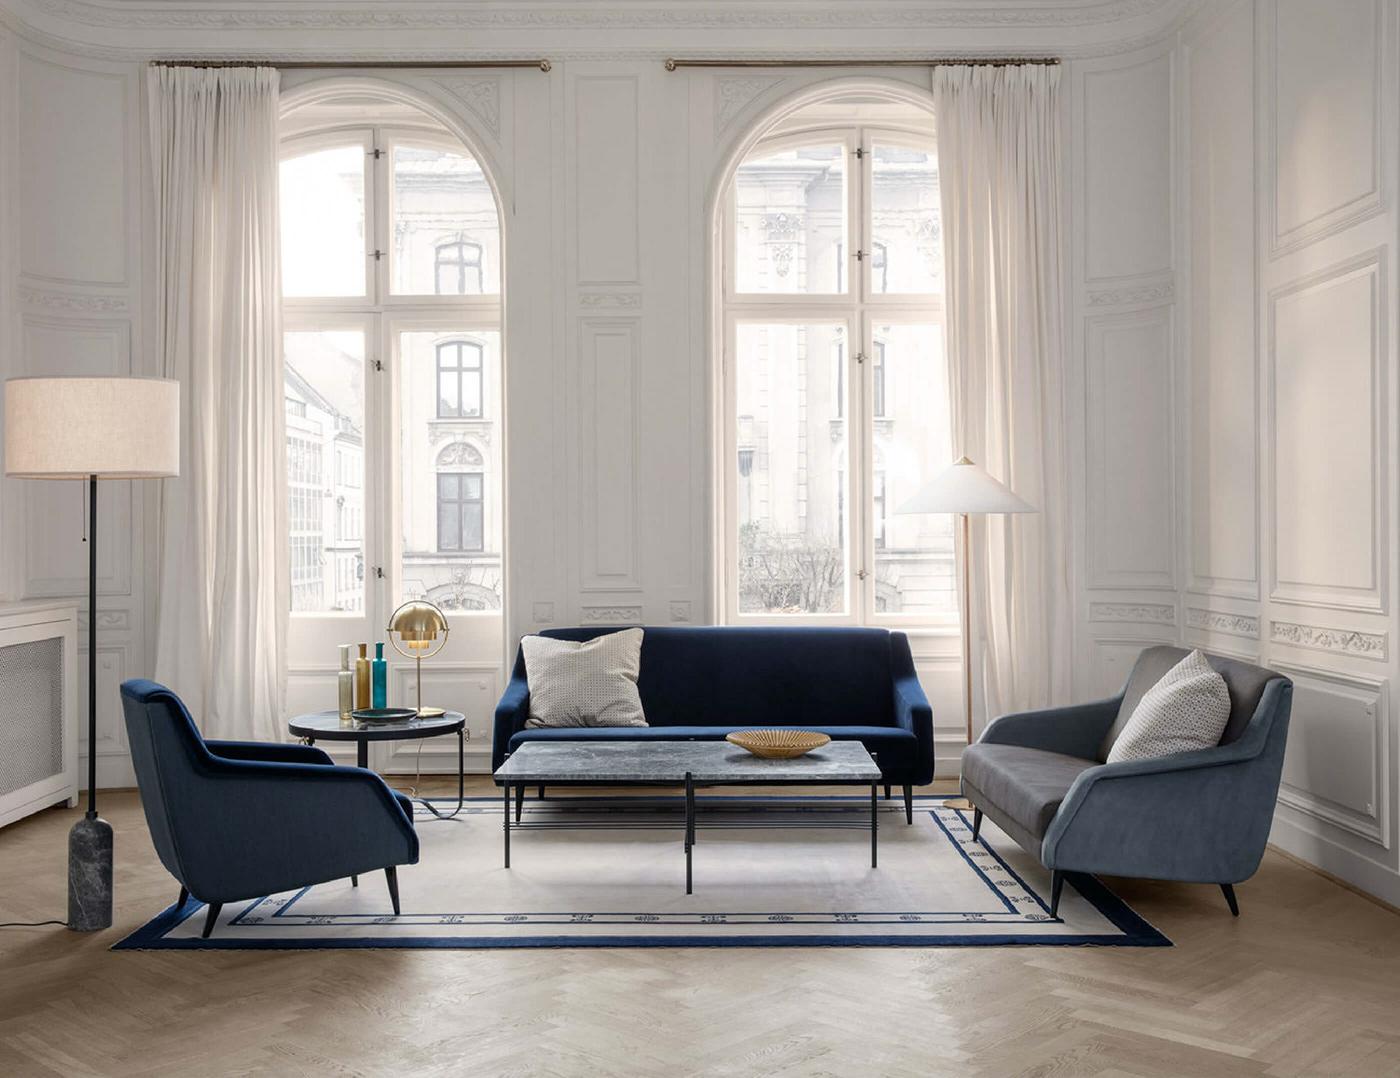 e-commerce,Ecommerce,Fashion ,furniture,high-end,luxury,uxui,Webdesign,Website